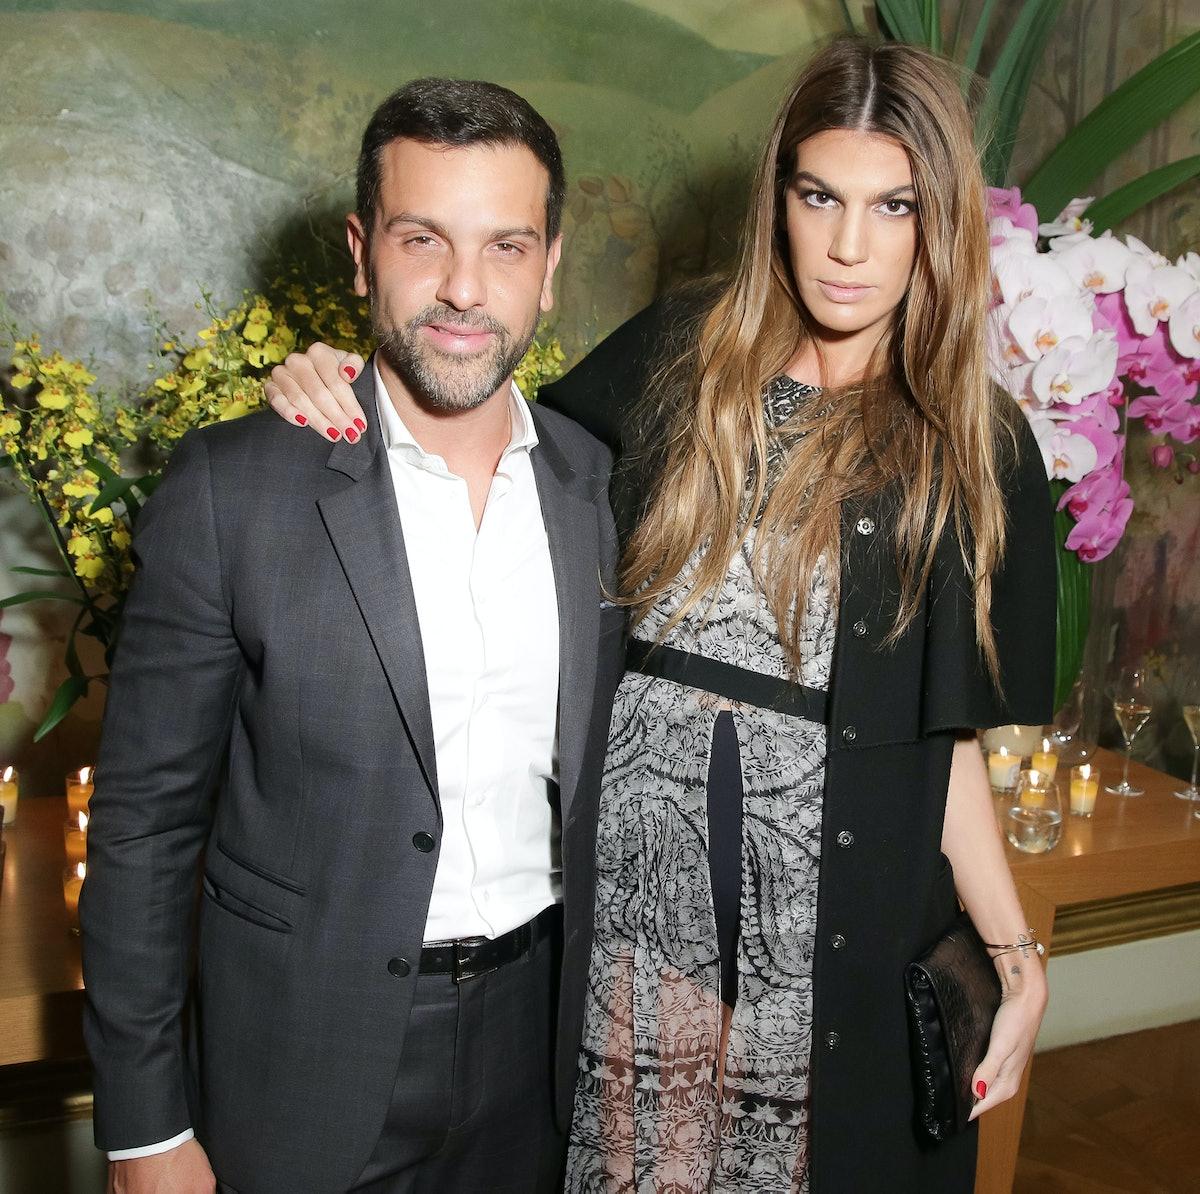 Alexandre Birman, pictured here with Bianca Brandolini,